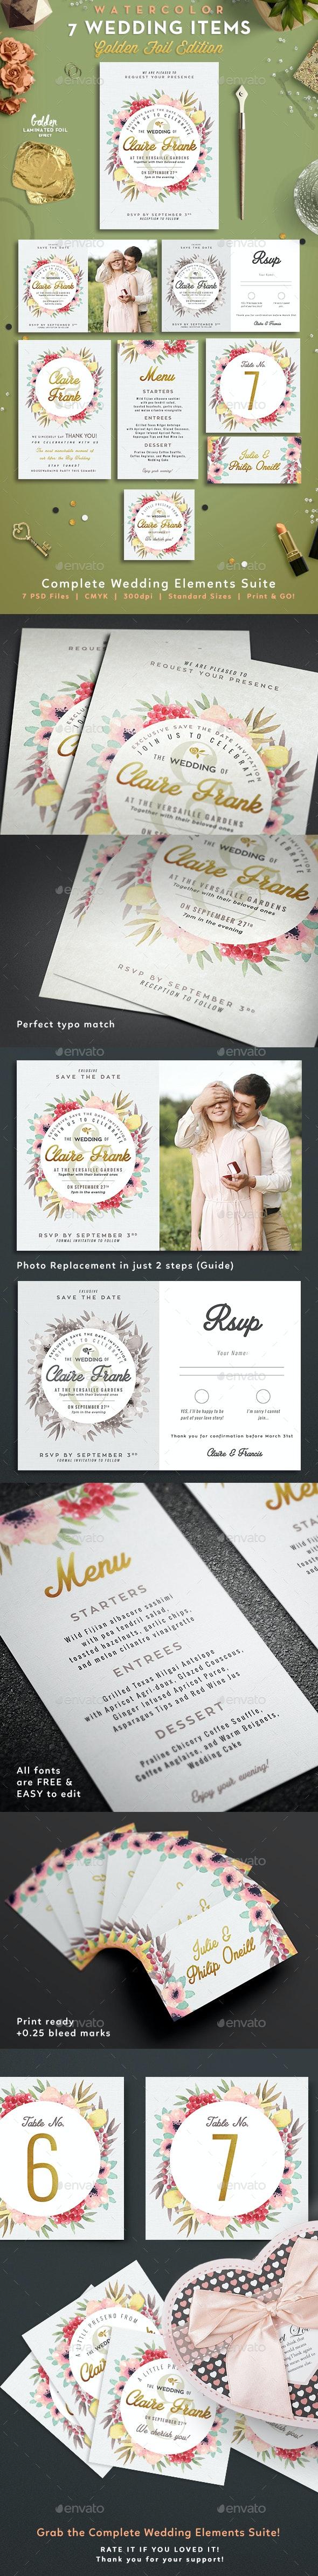 7 Watercolor Foliage Wedding Items - Invitations Cards & Invites